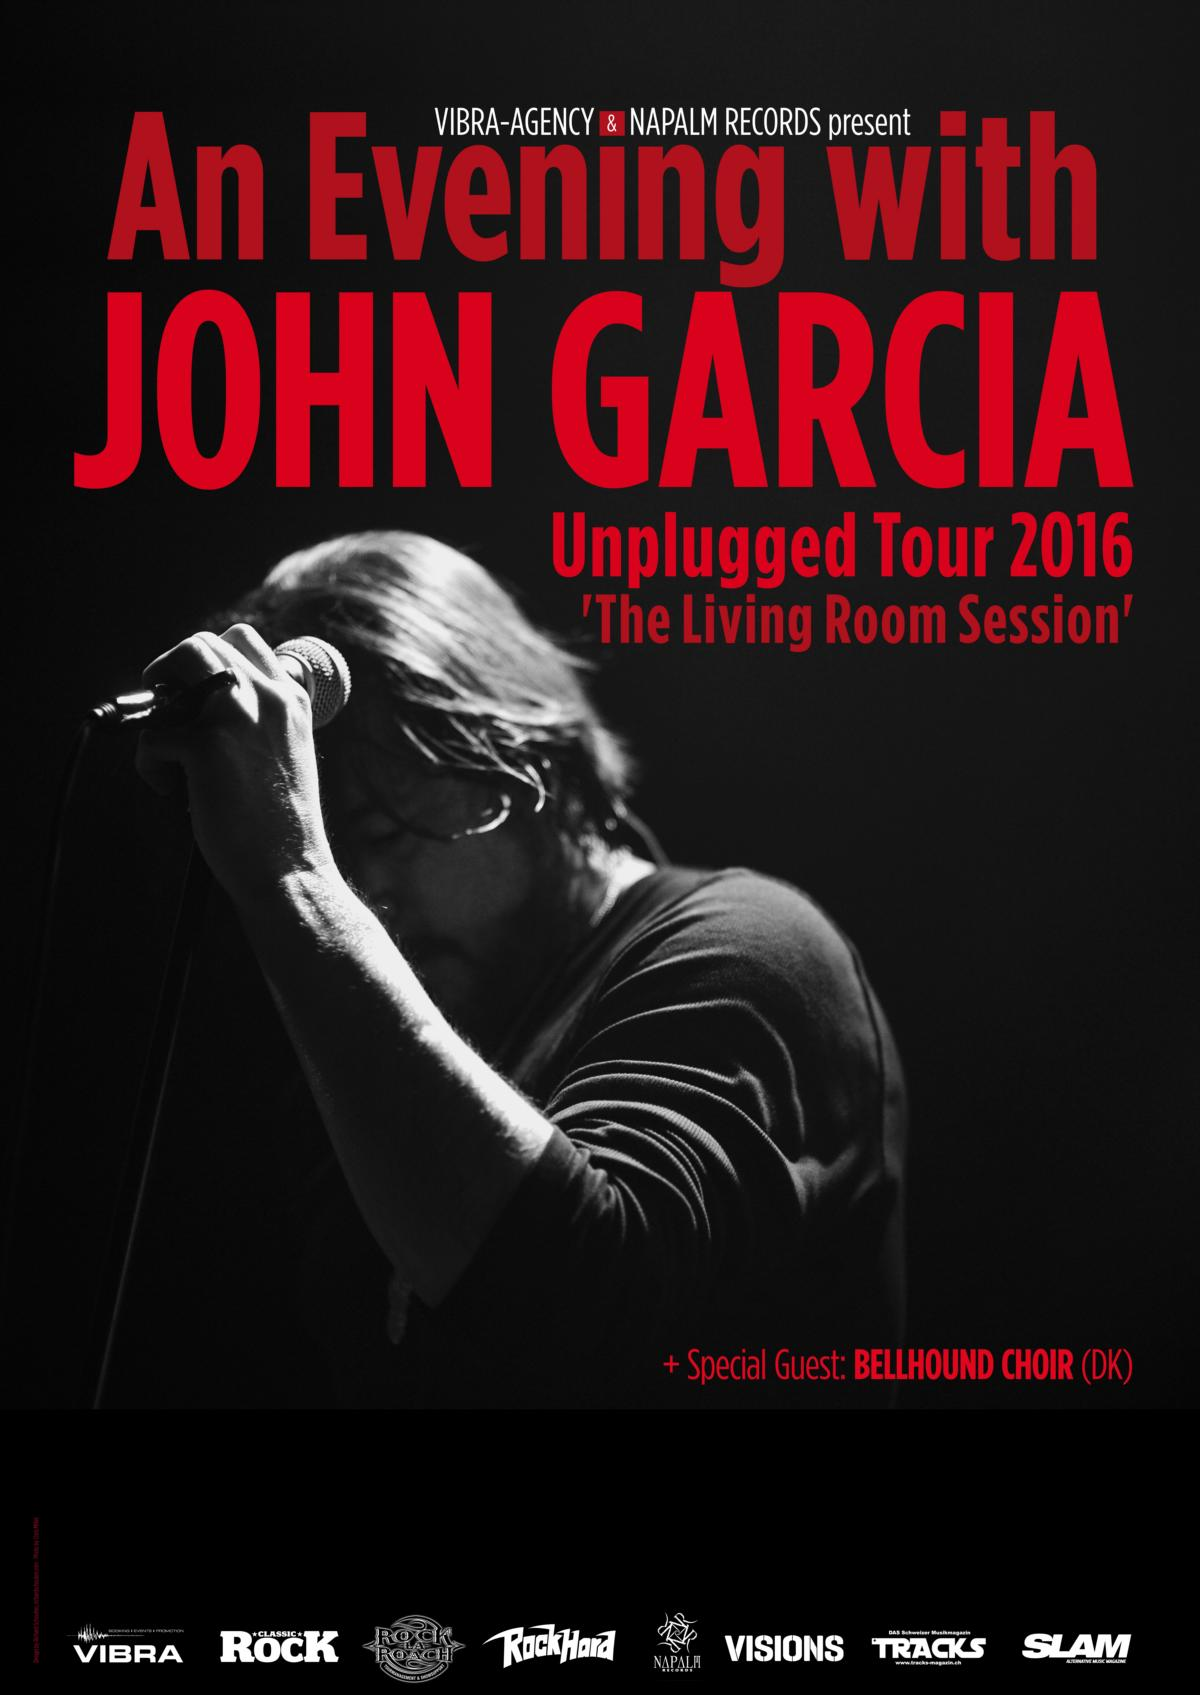 john garcia tour poster